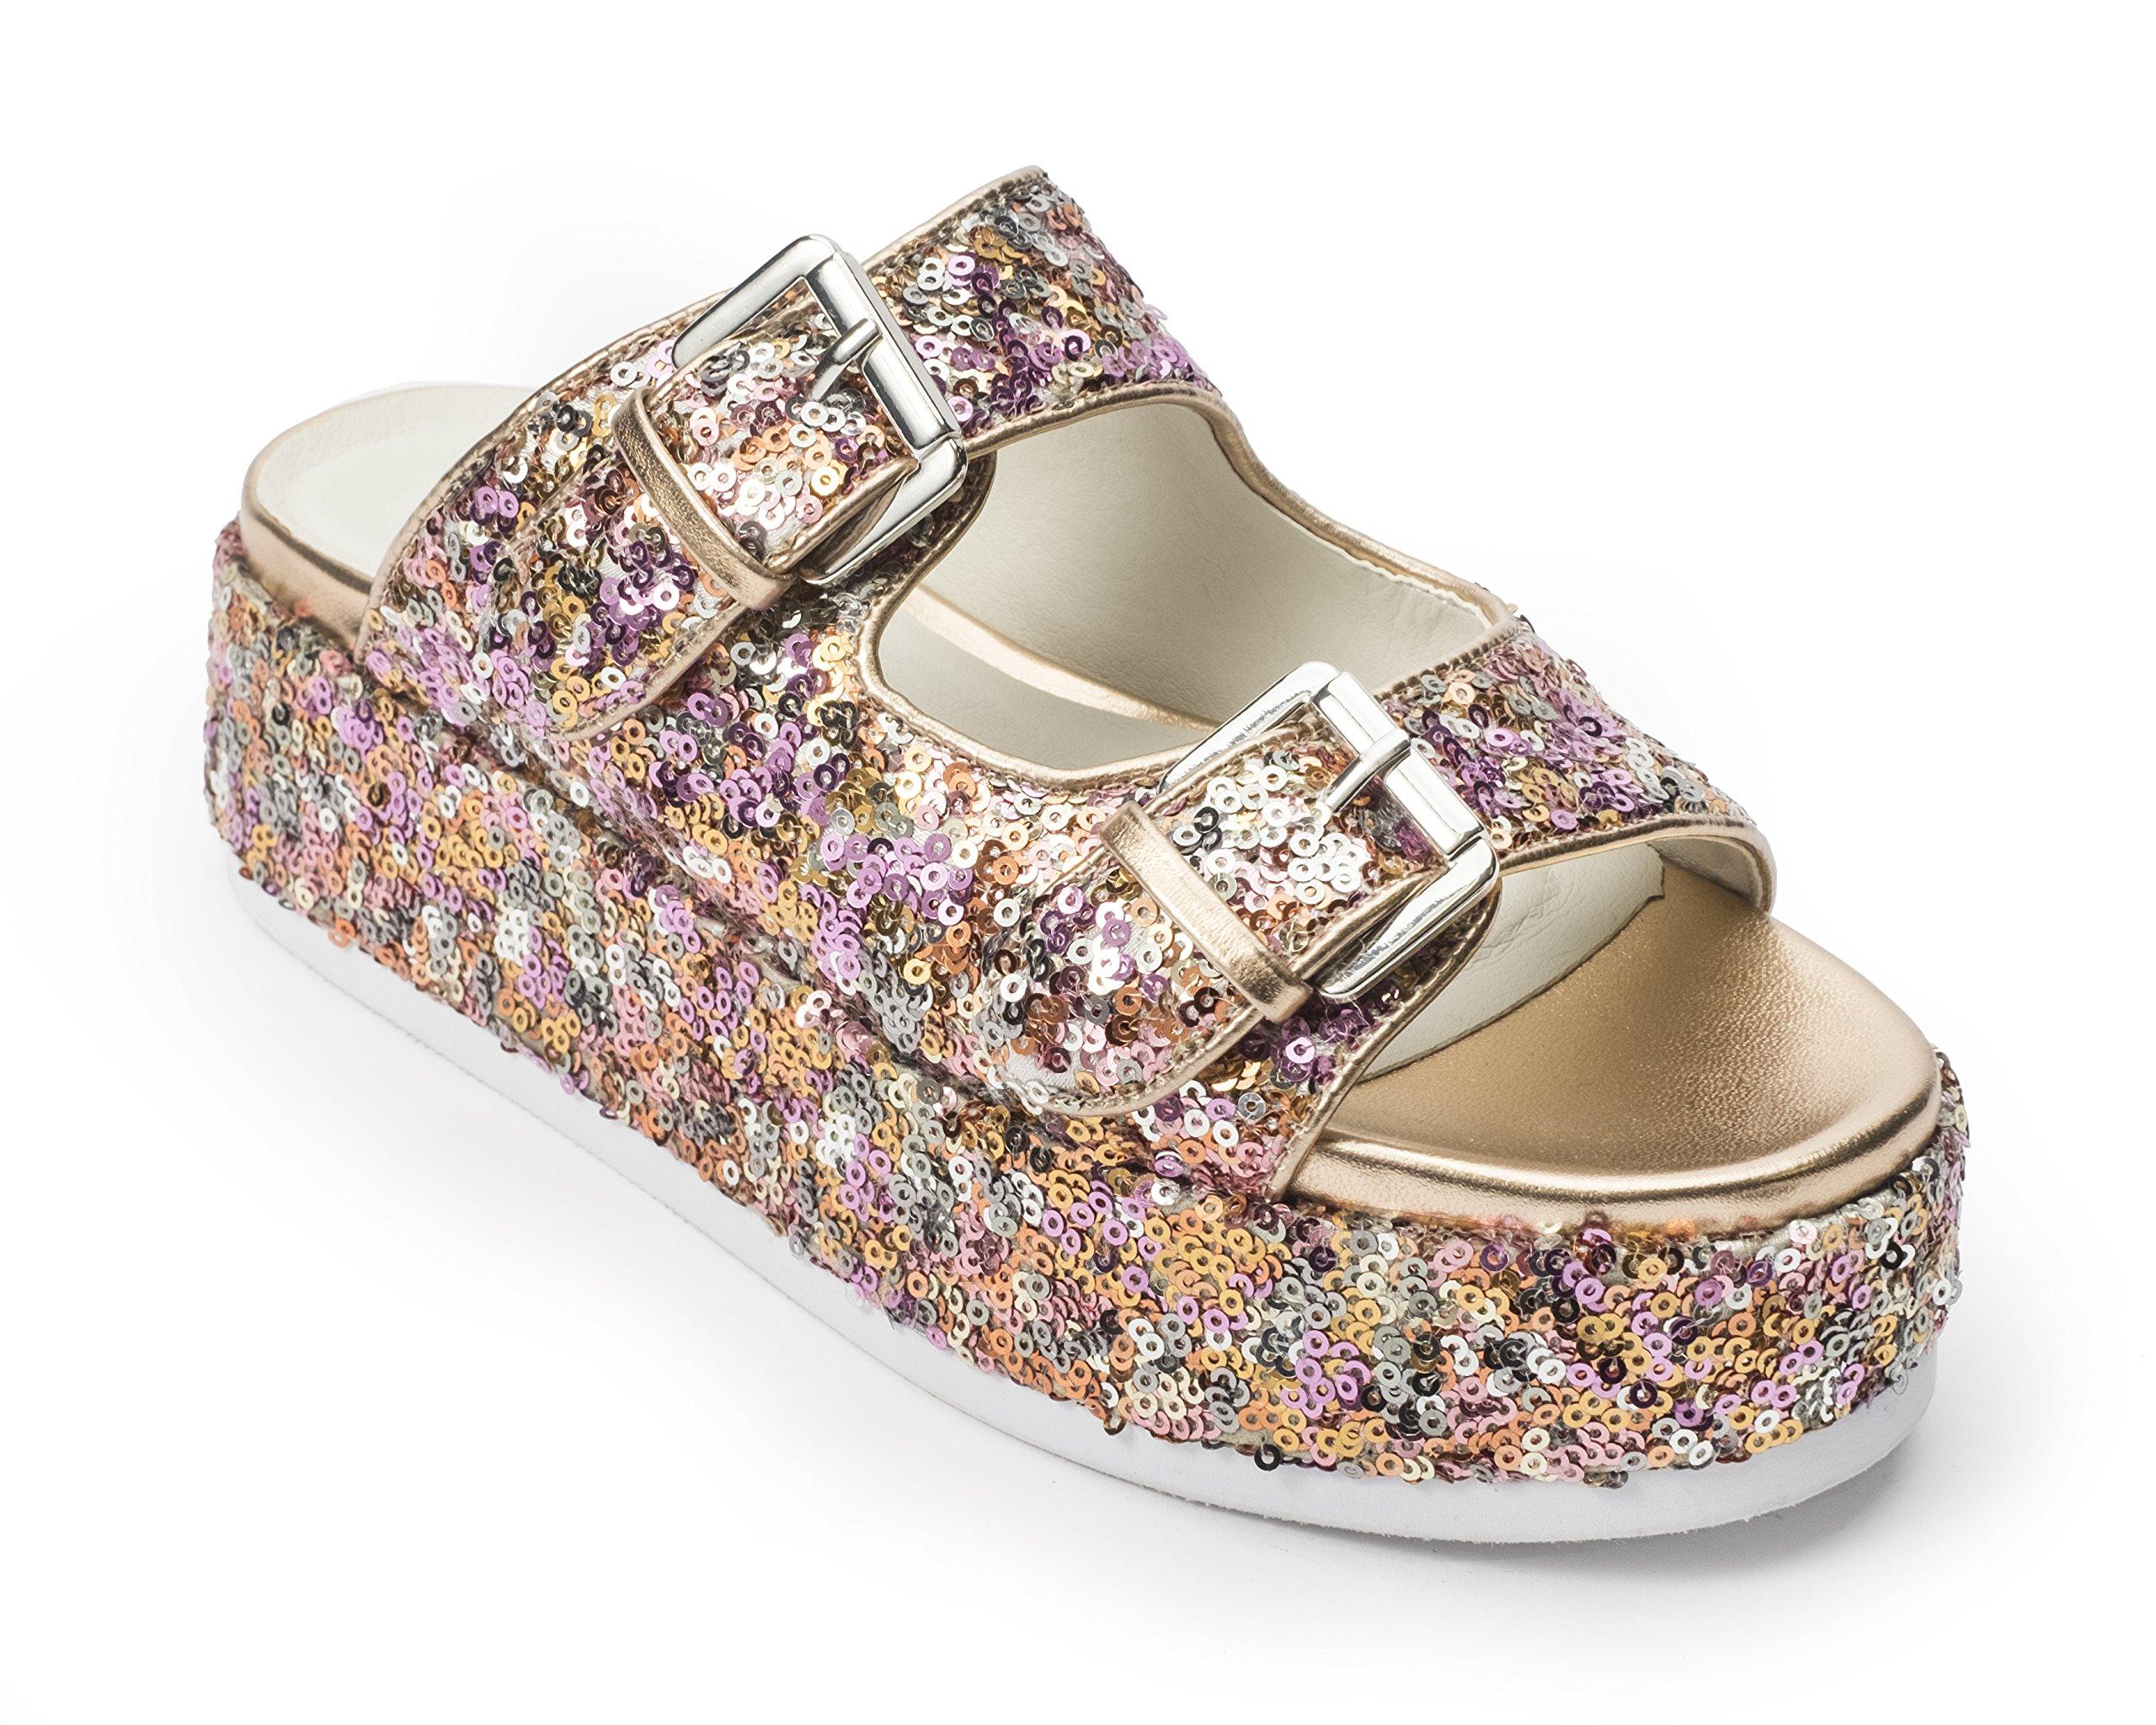 Jane and the Shoe Women's Jordan Rose Gold 2 Buckle Platform Sandal Size 8